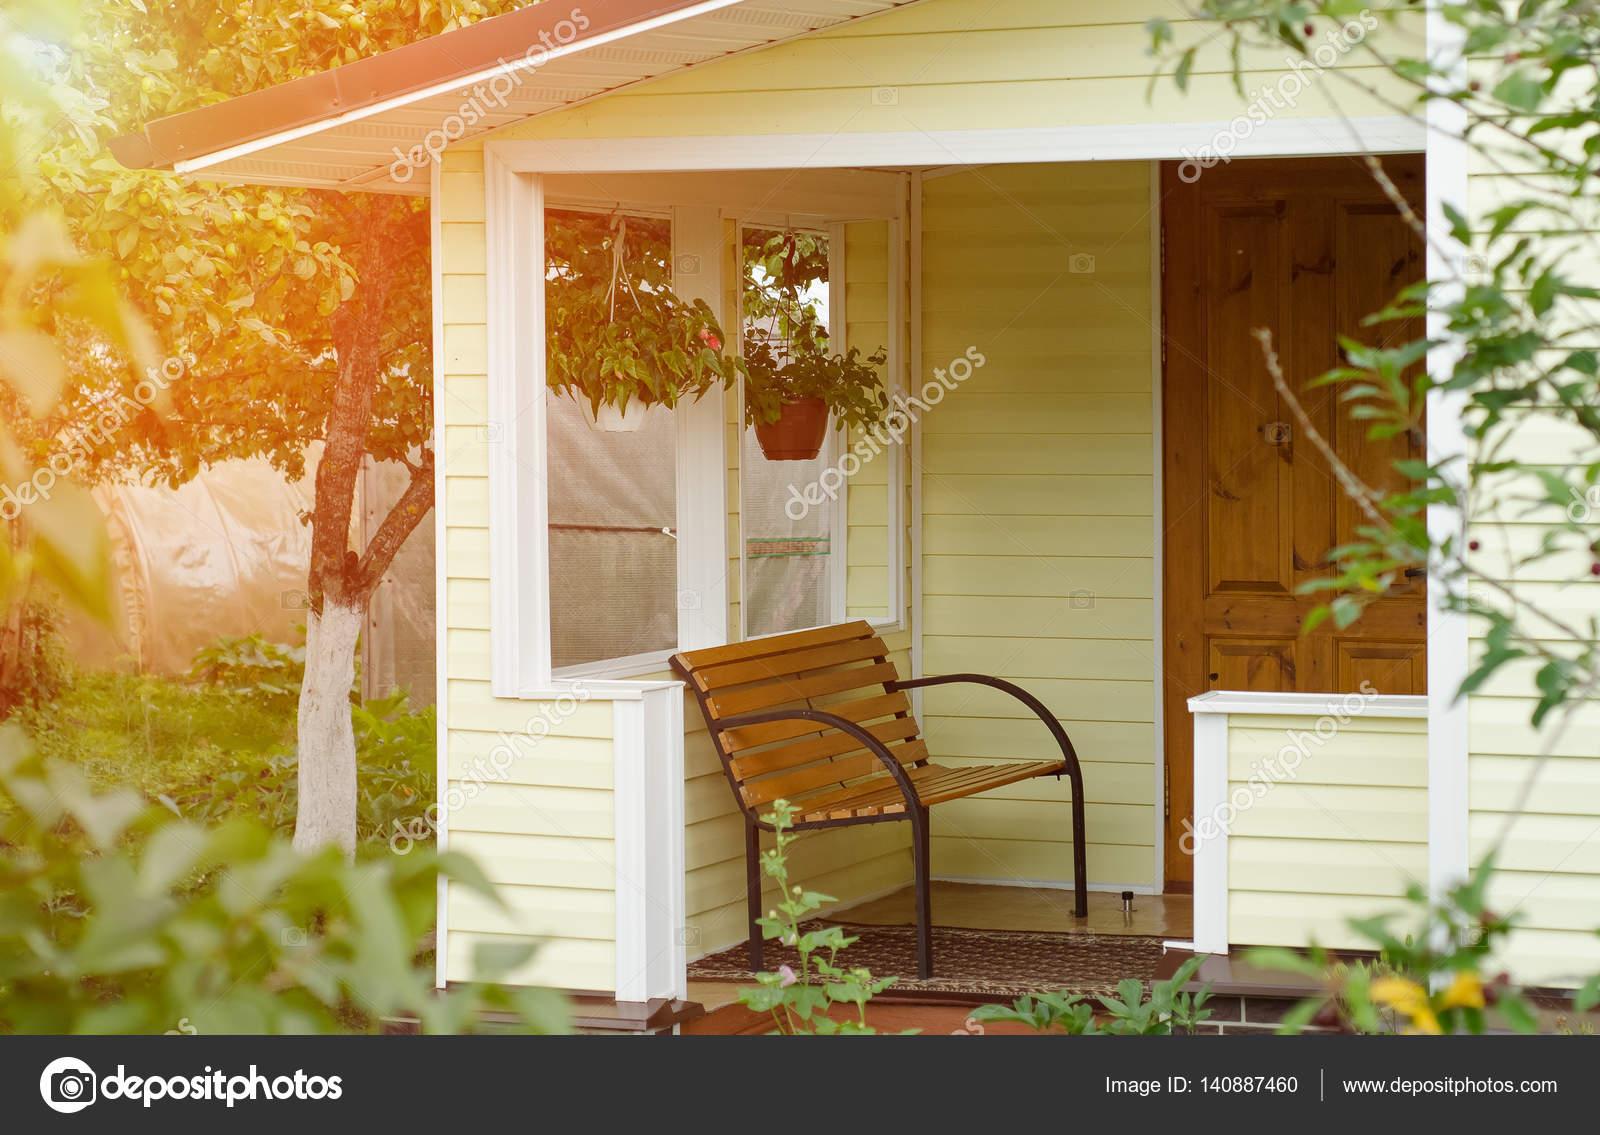 Entree portiek versierd met bank. rusland u2014 stockfoto © bizoner777